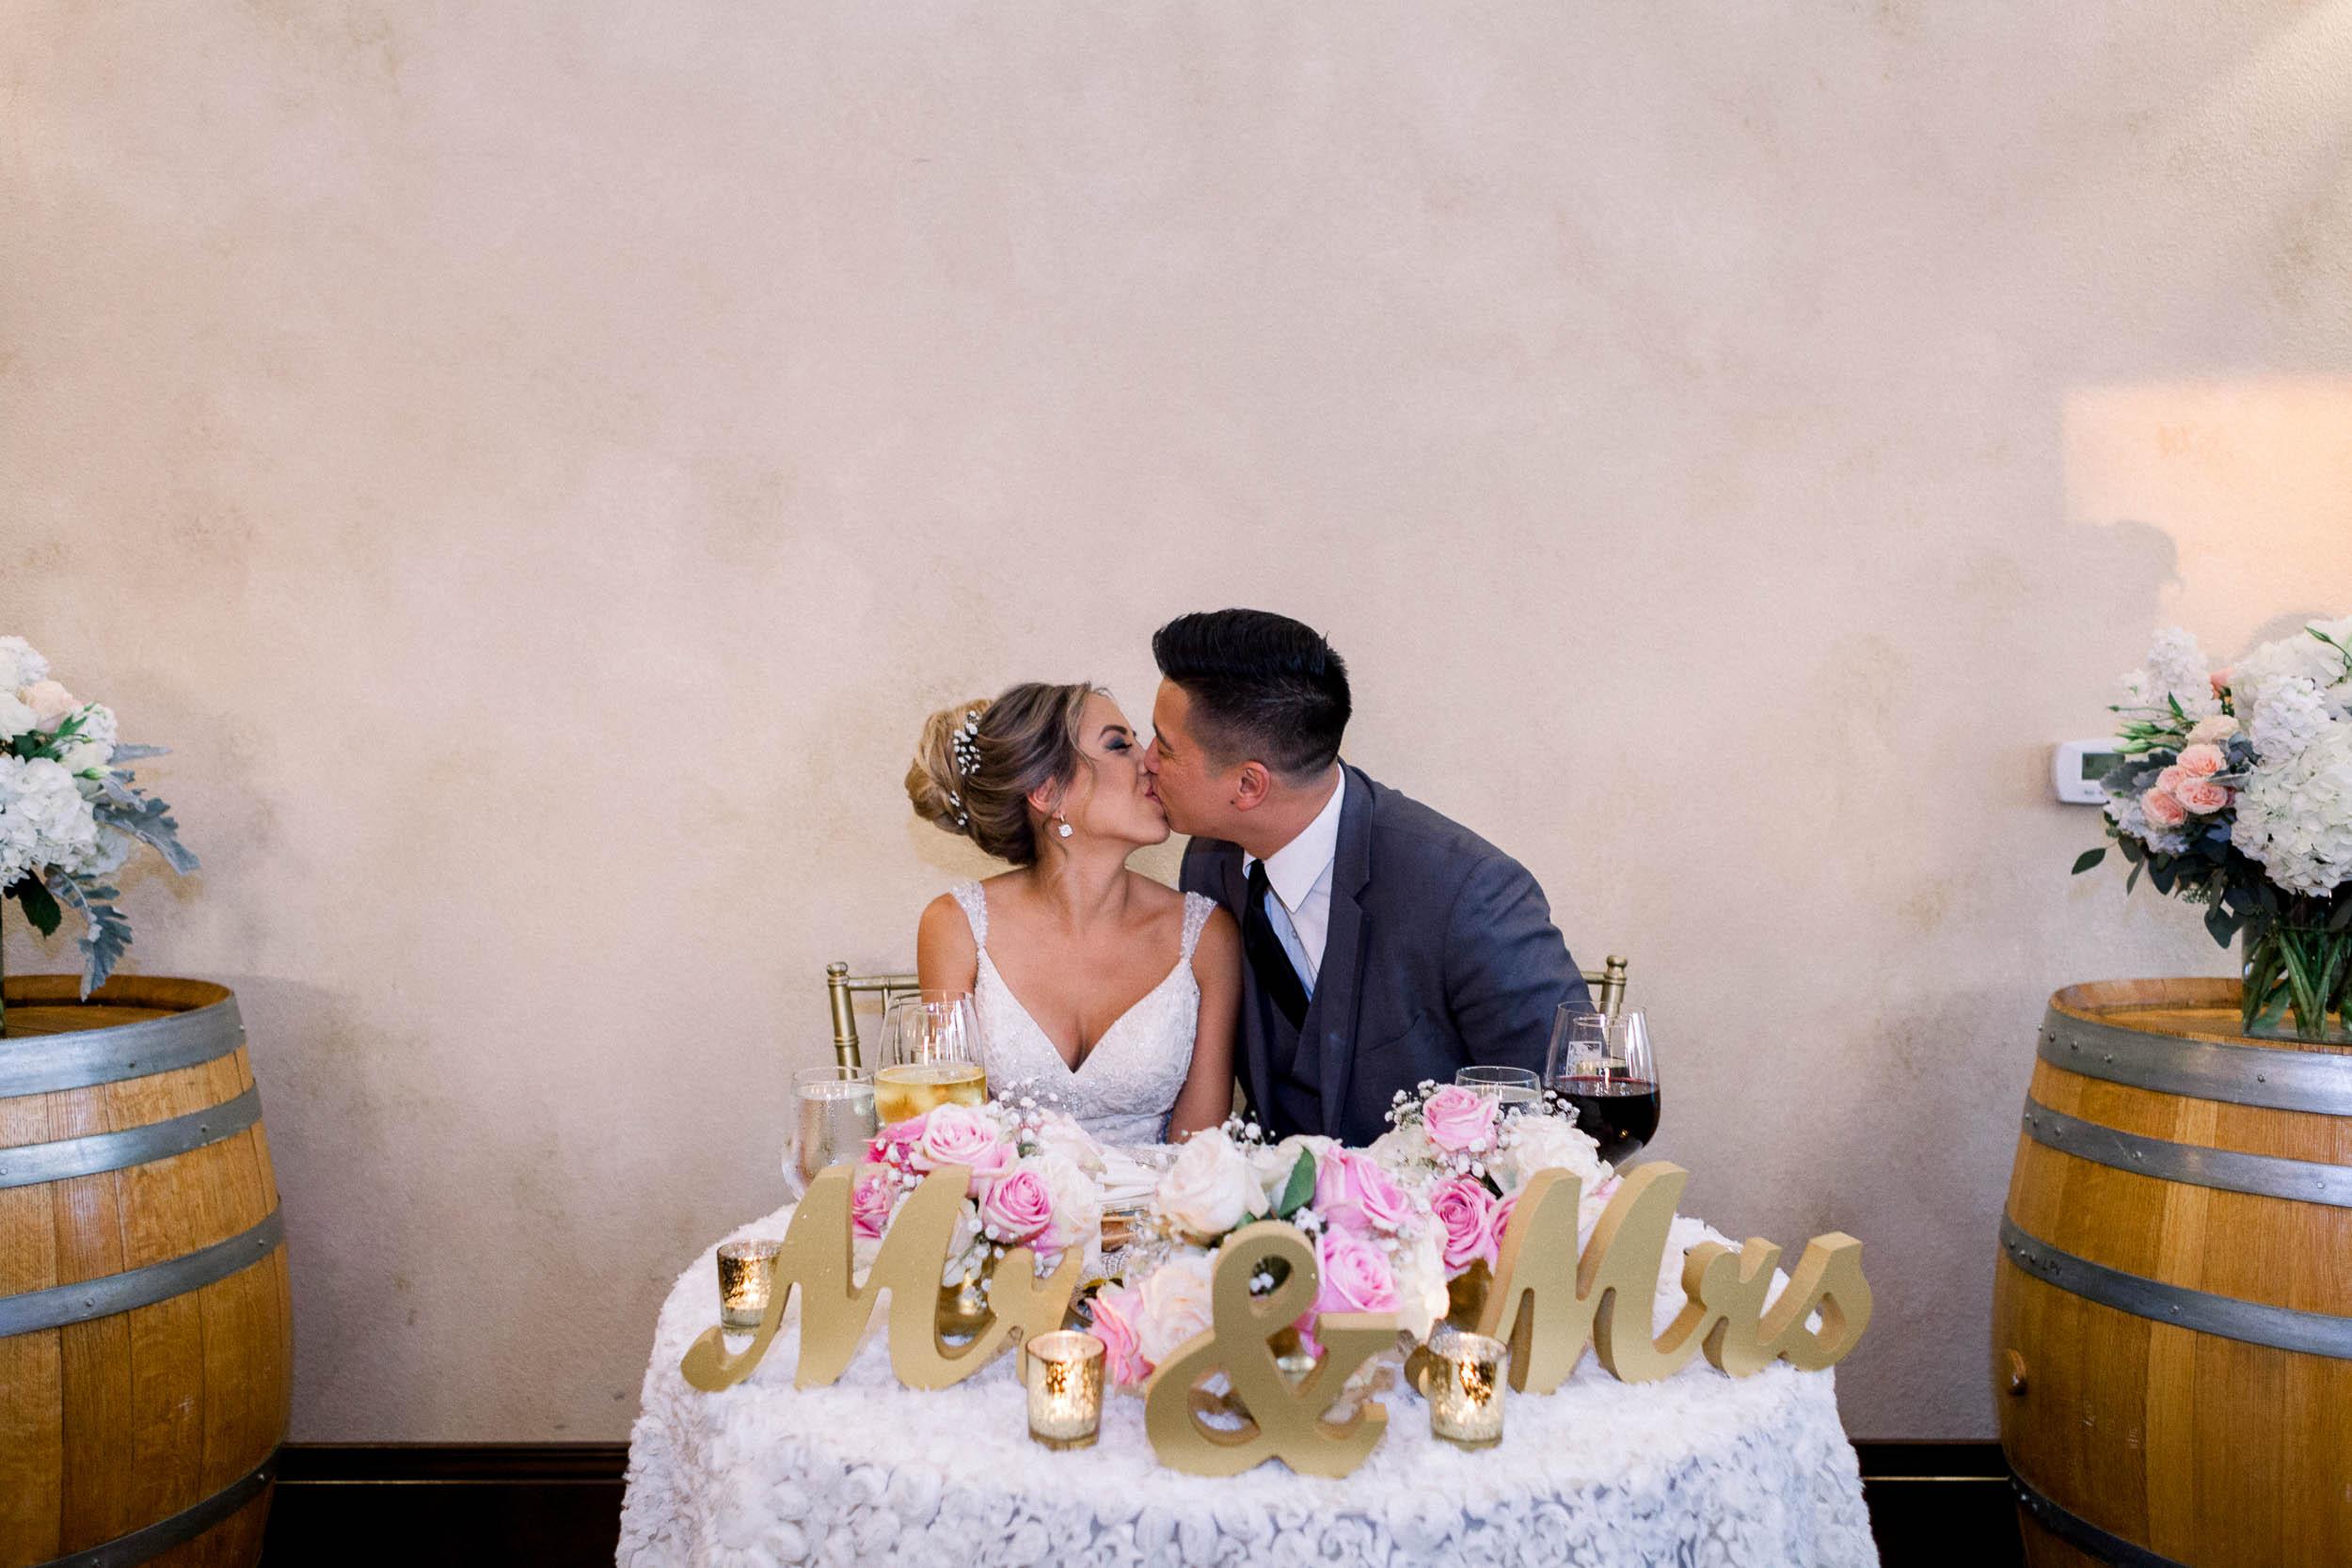 Las Positas Wedding_Buena Lane Photography_090118ER735.jpg